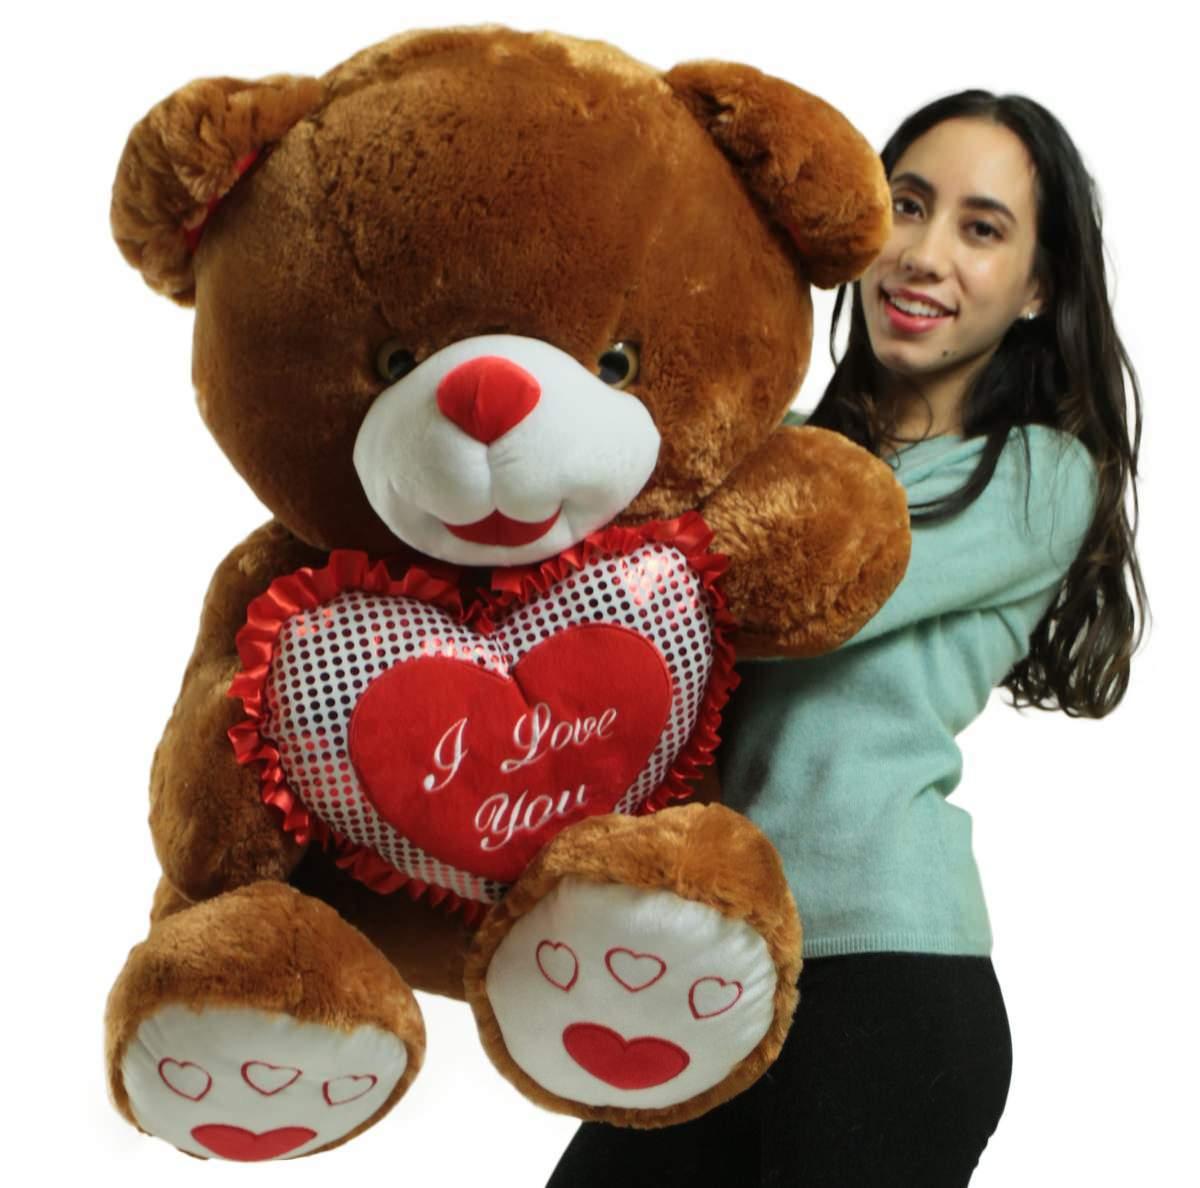 188b5c3d82b Giant Soft Brown Teddy Bear 30 Inches and 25 similar items. E2402331 e17b  4023 8153 bc3bac6c1cfc